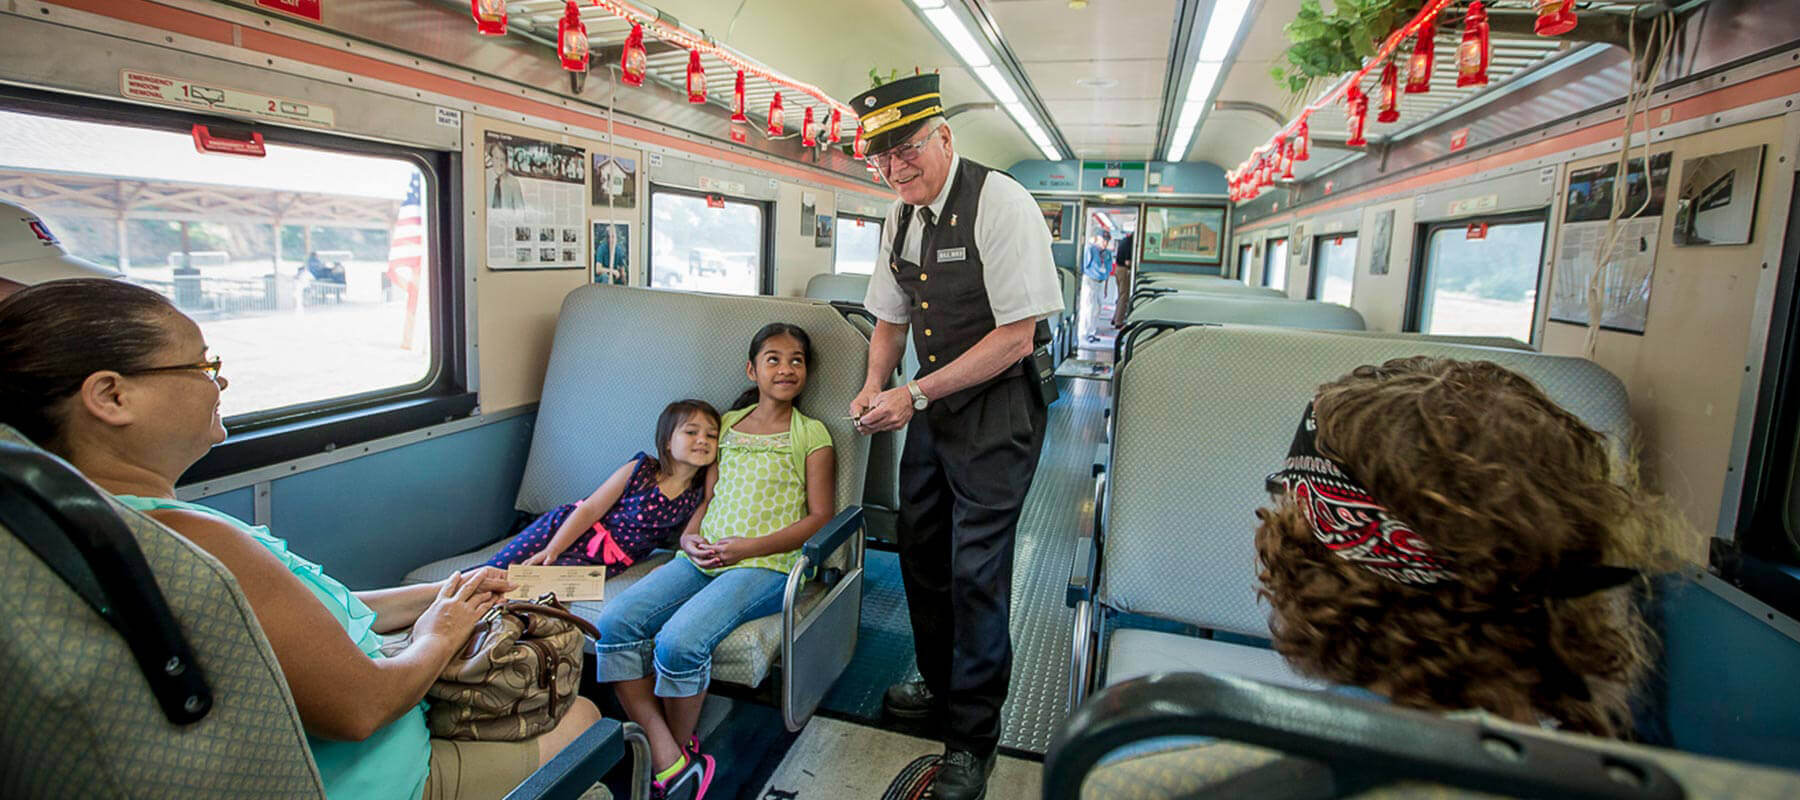 Lake-Blackshear-Weekend-Getaways-Georgia-GA-Veterans-Park-SAM-Shortline-Train-Slider-3-georgia-train-rides